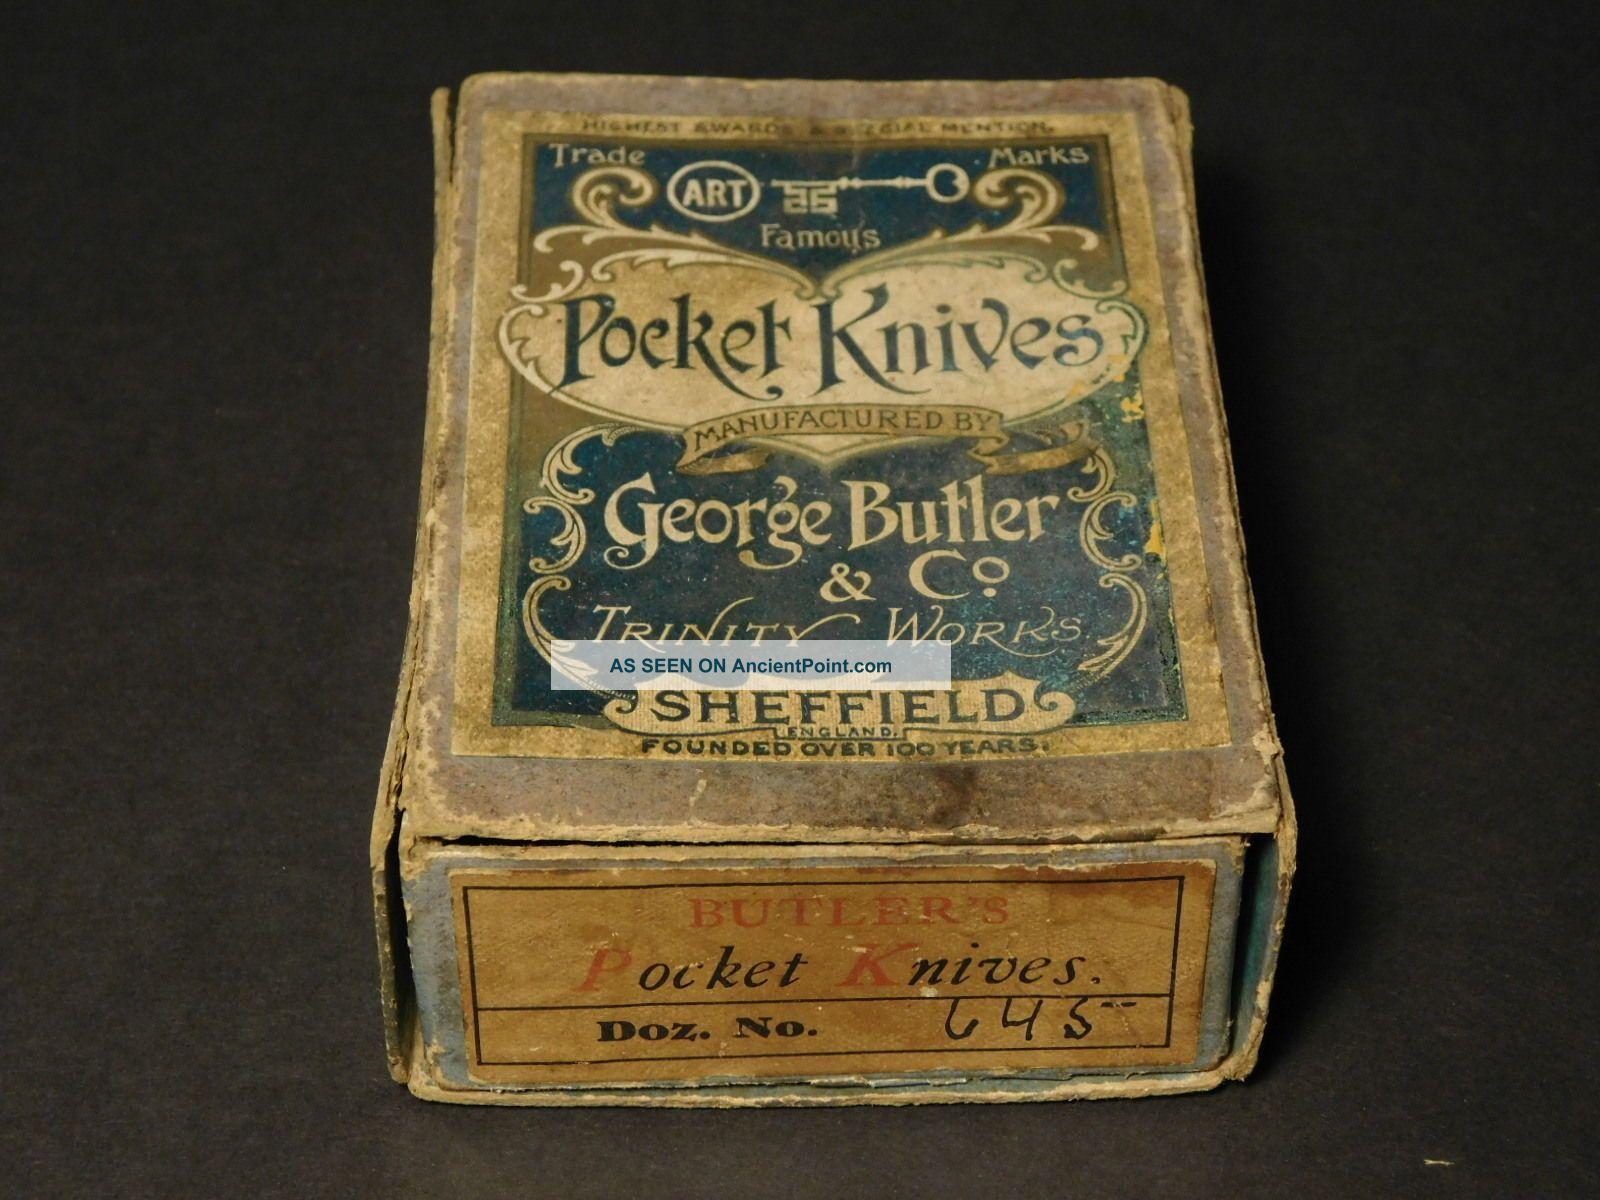 George Butler & Co.  Trinity Pocket Knives Box Of Harness Awls Needles Needles & Cases photo